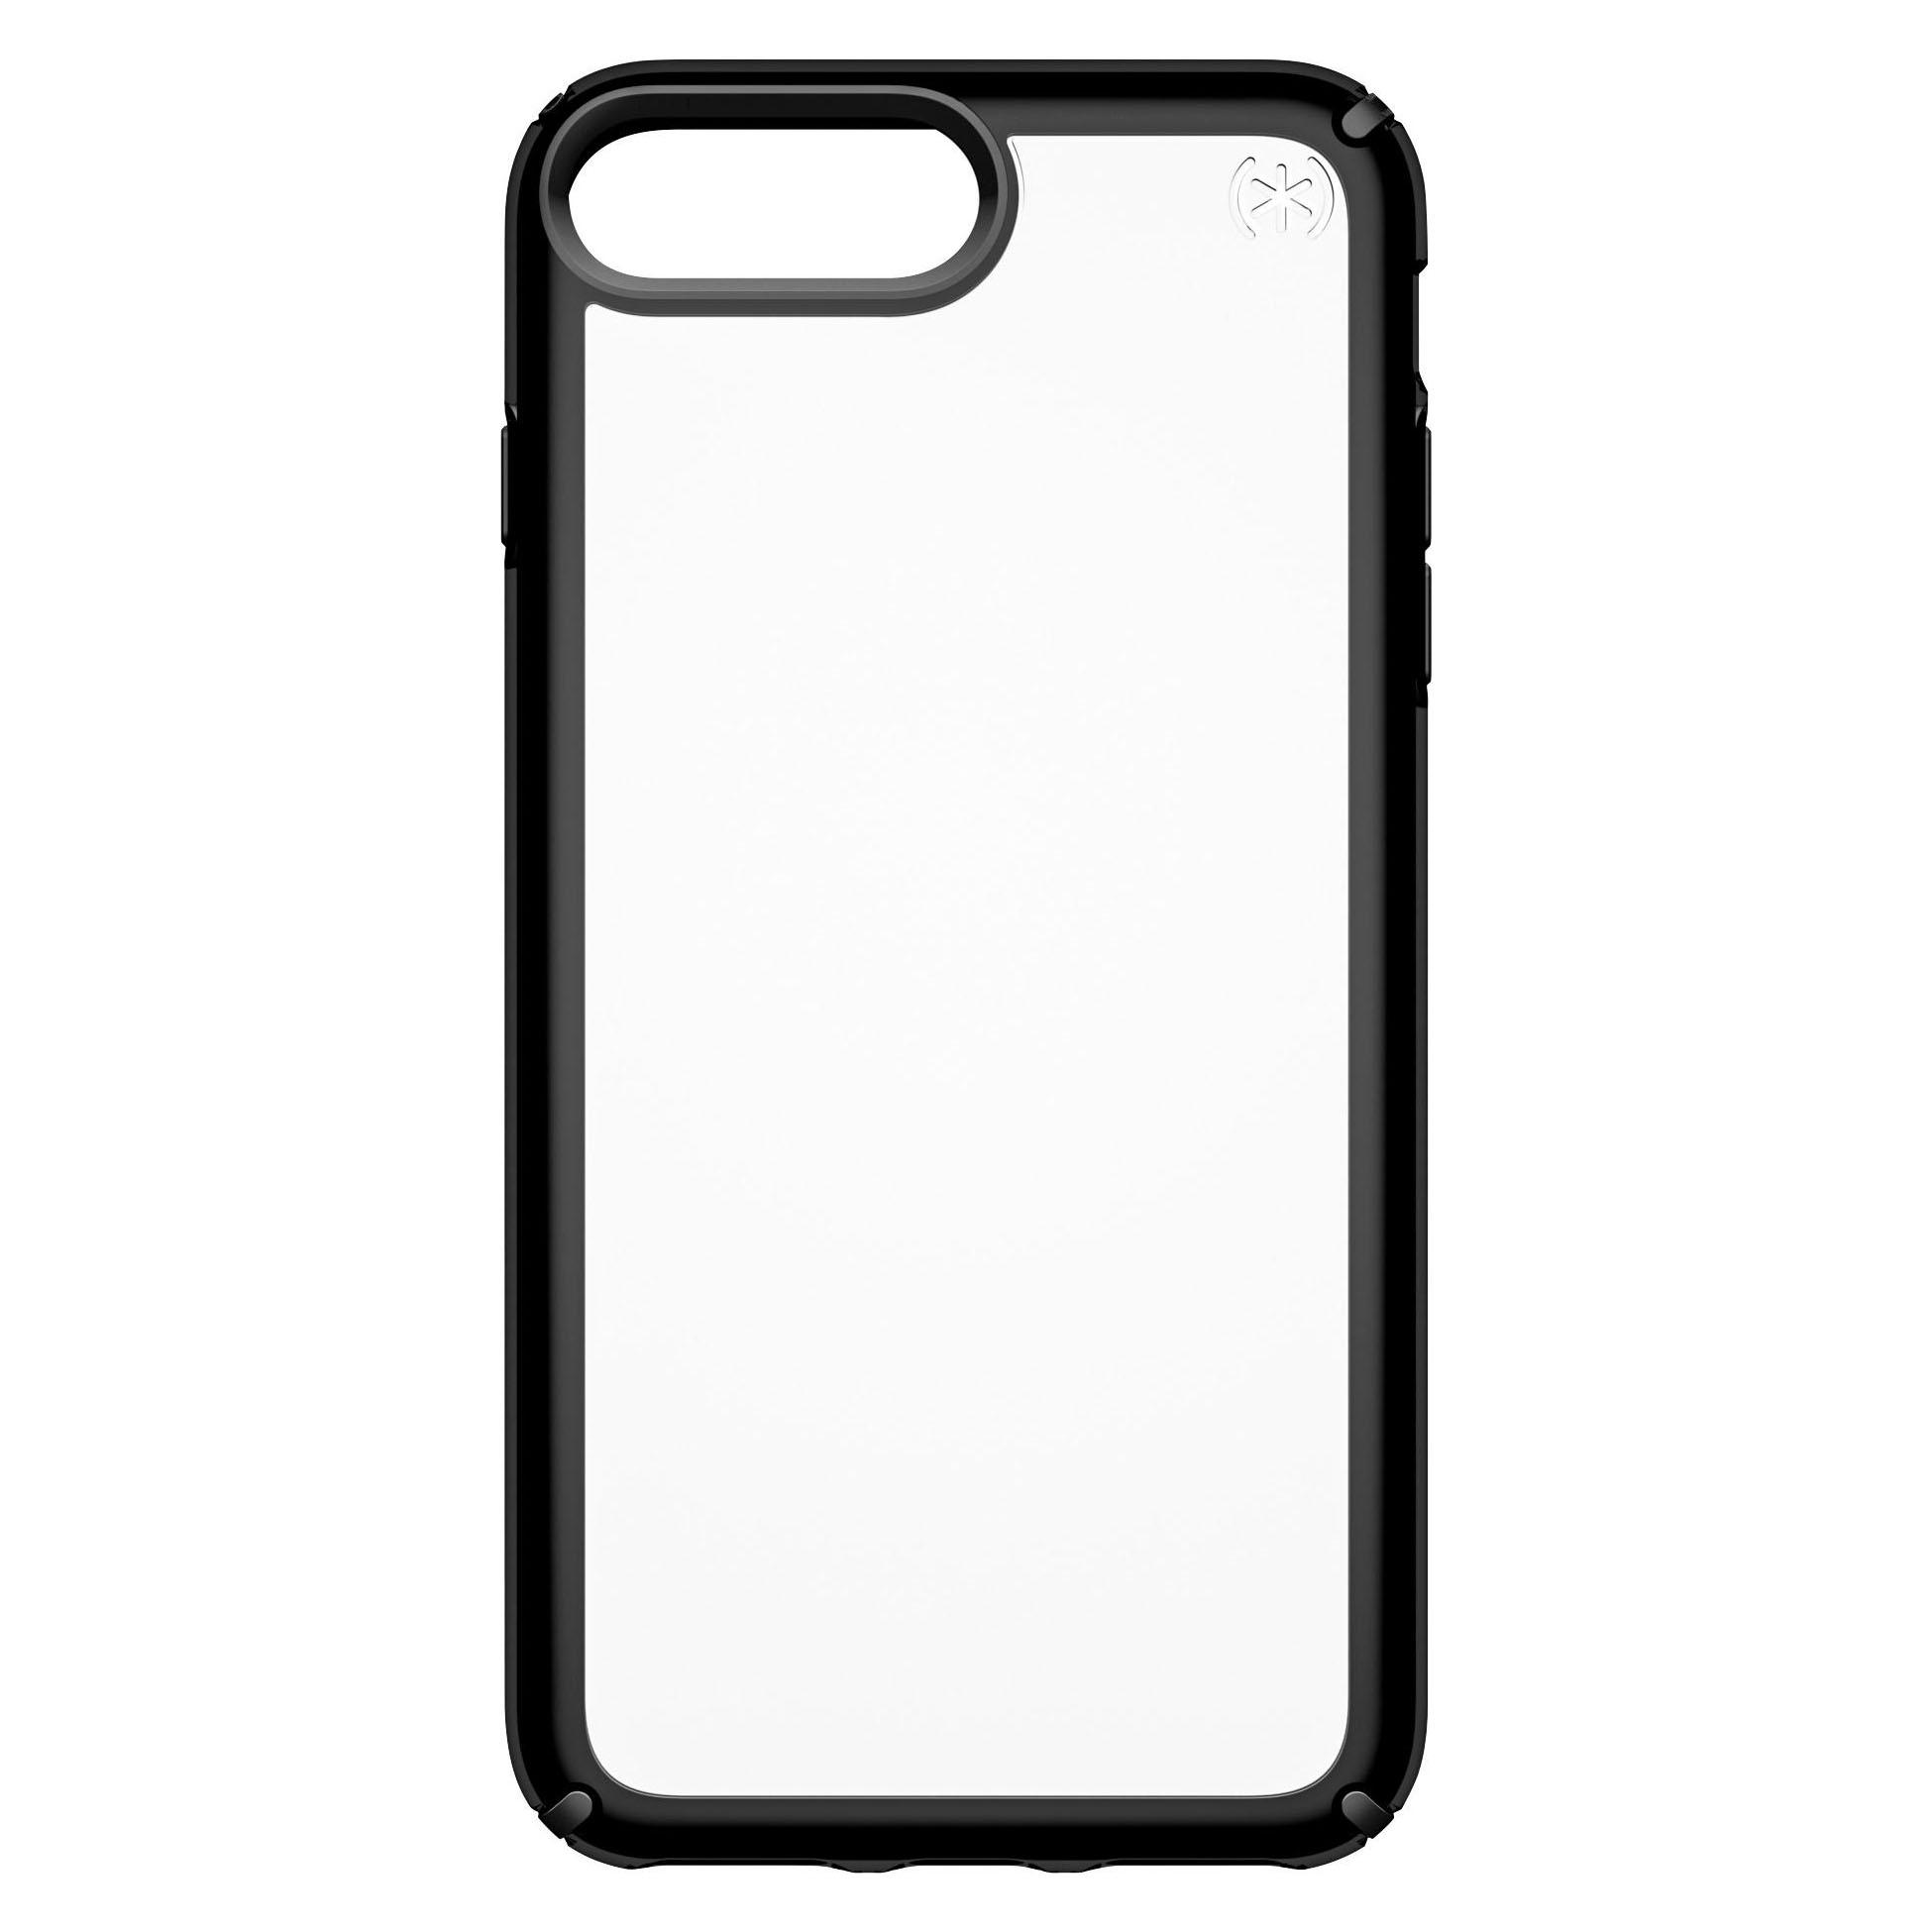 Speck Presidio Show Case for iPhone 7 Plus, 8 Plus - Black/clear